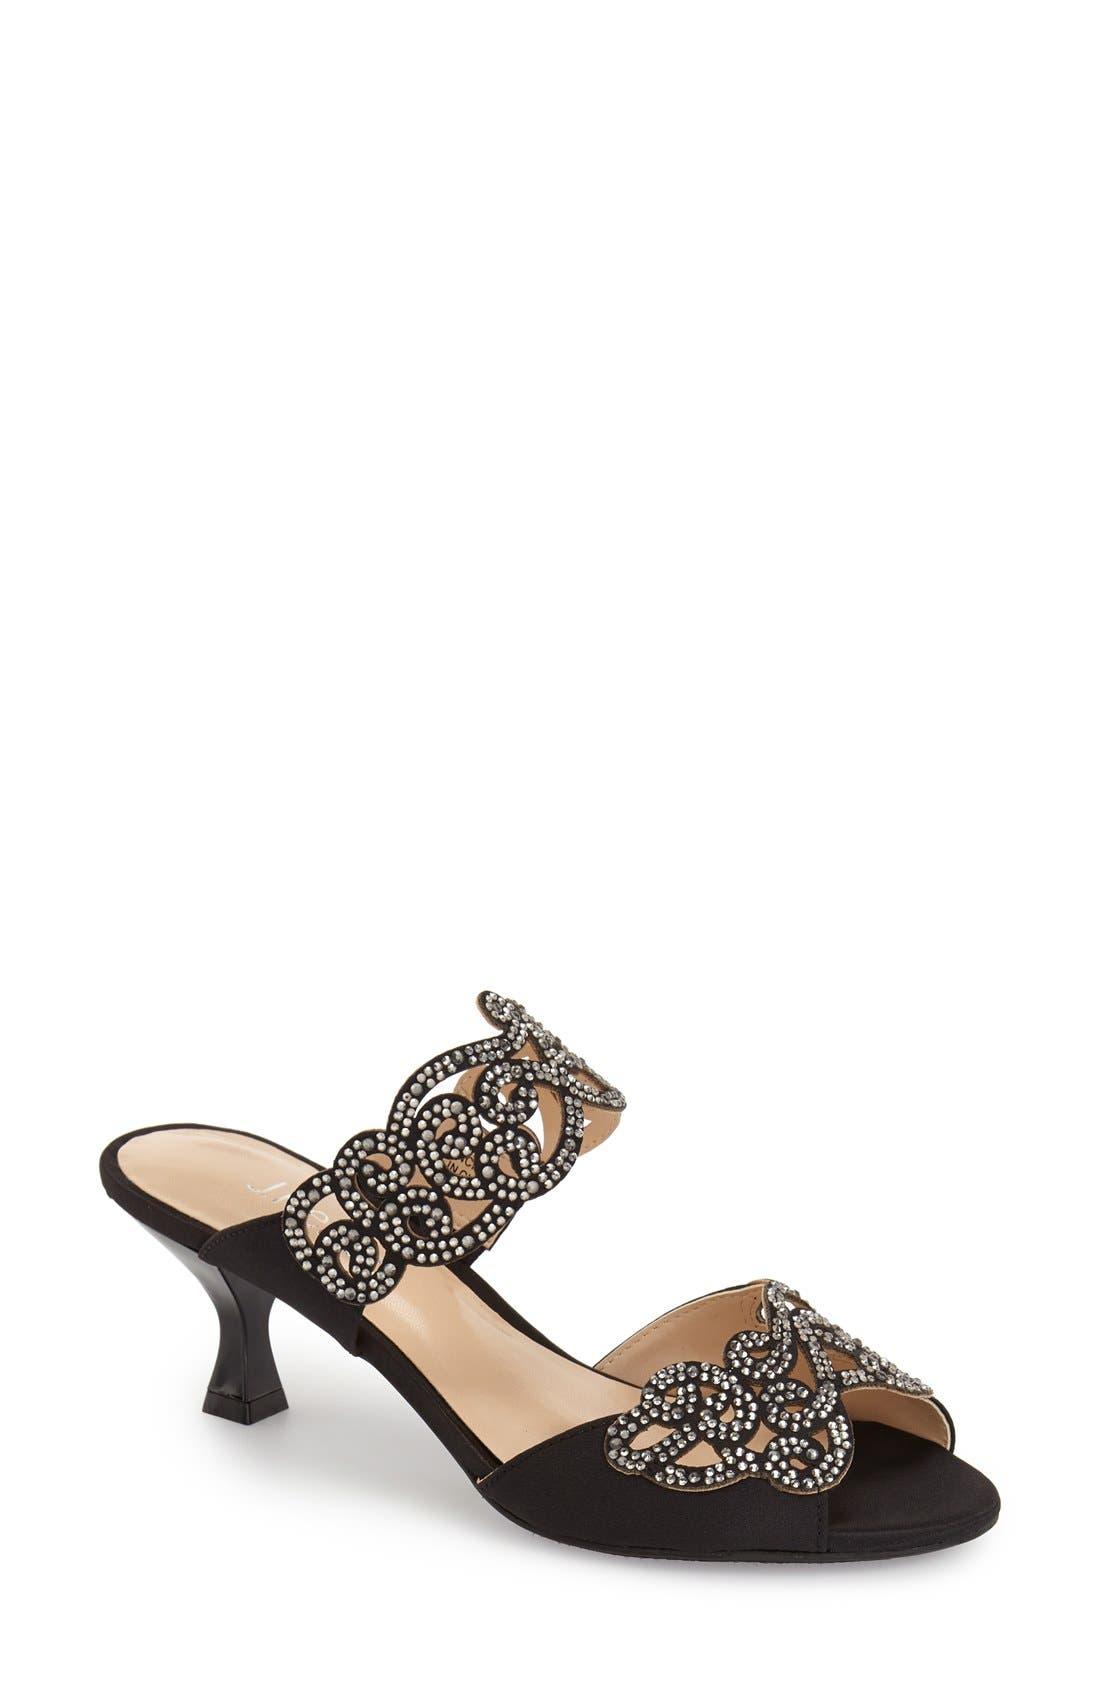 Alternate Image 1 Selected - J. Reneé 'Francie' Evening Sandal (Women)